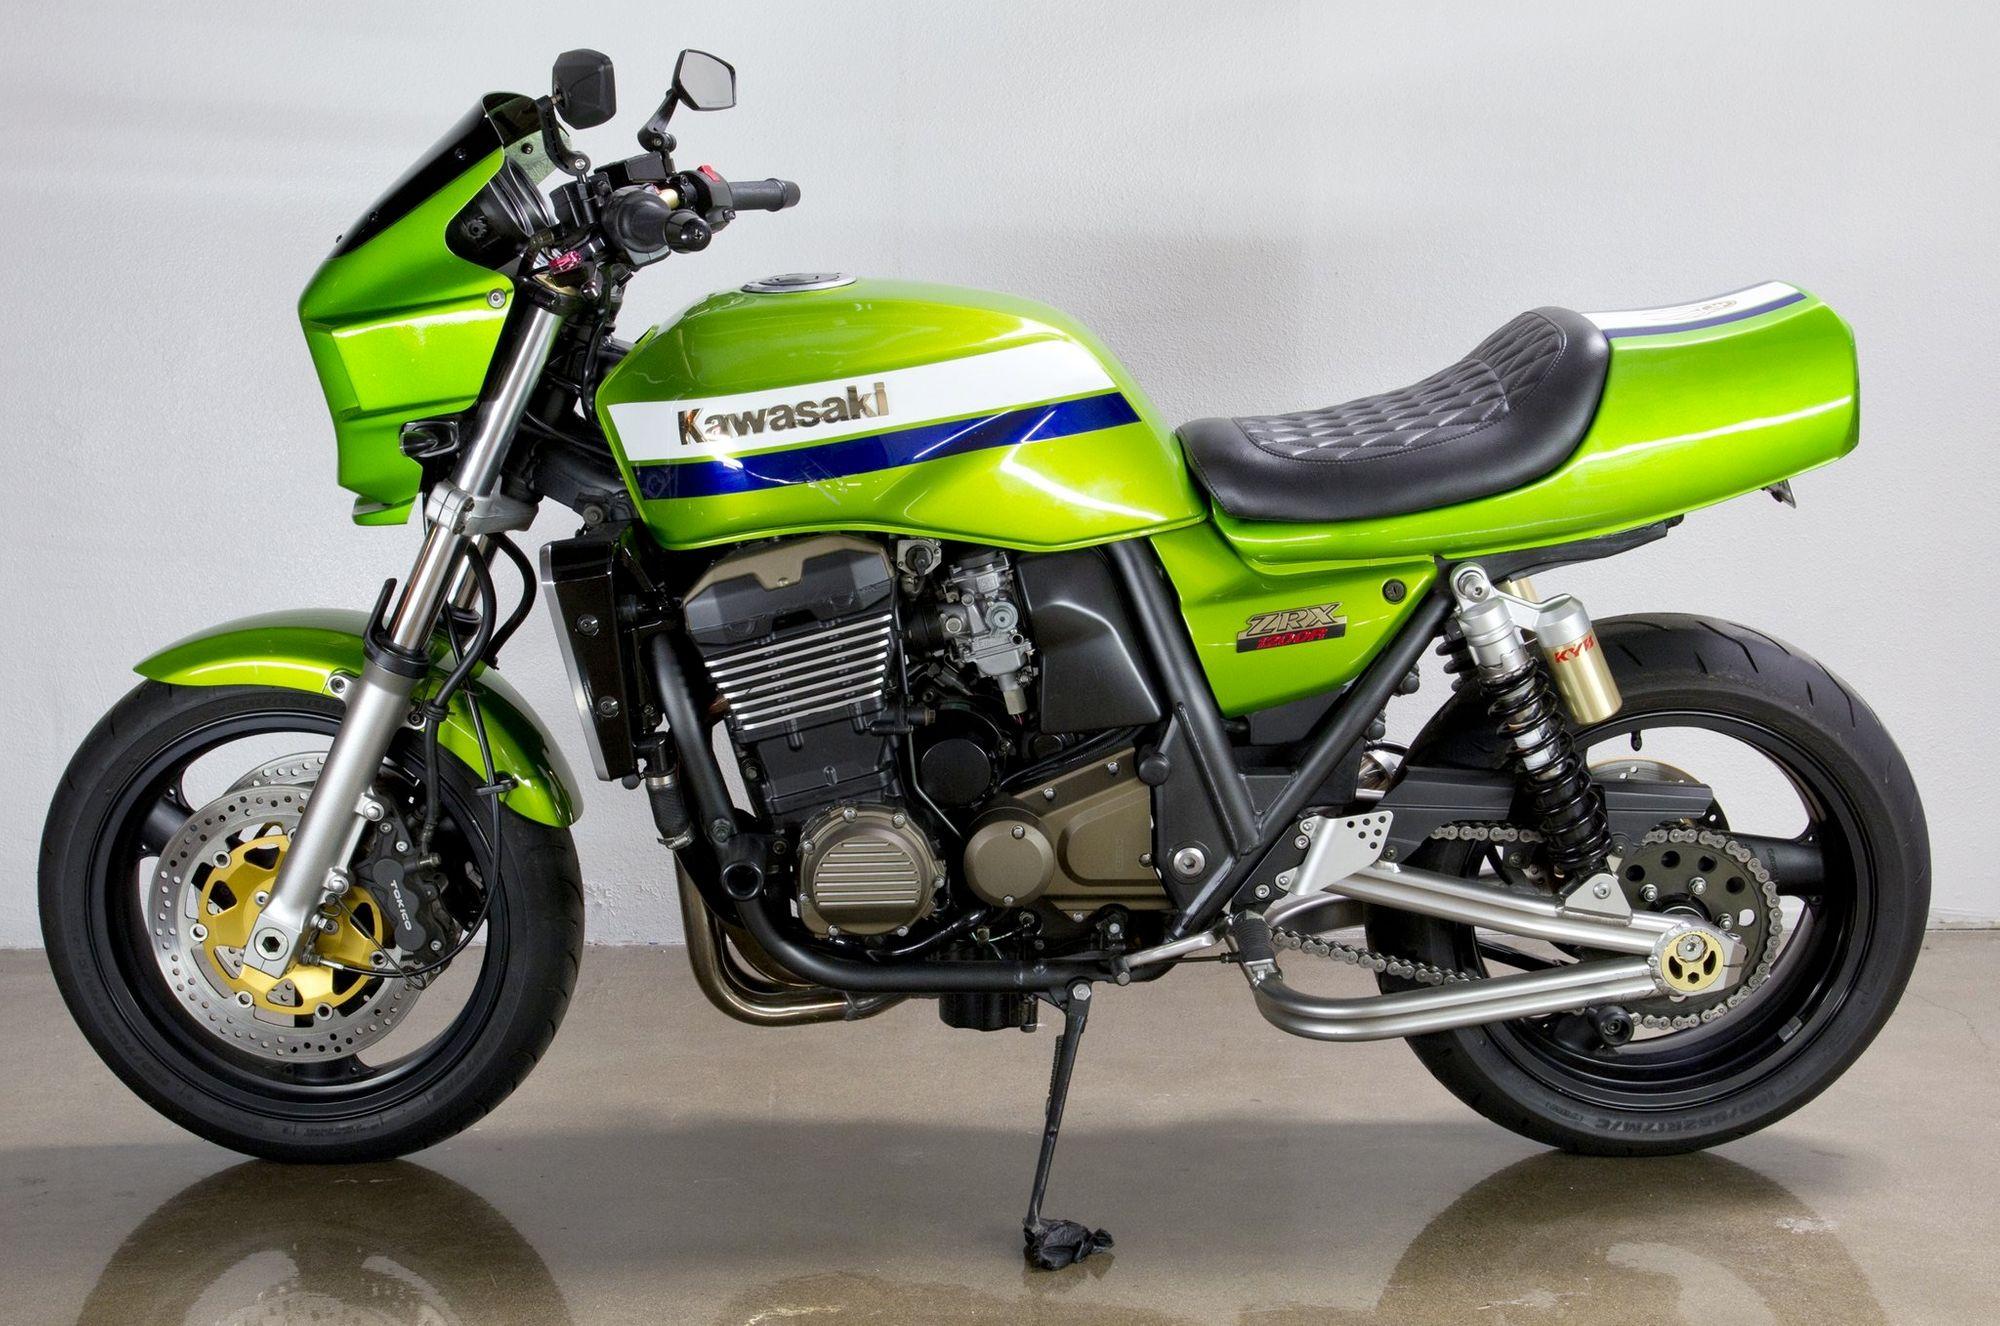 The Kawasaki ZRX1200R Green - Eddie Lawson Replica